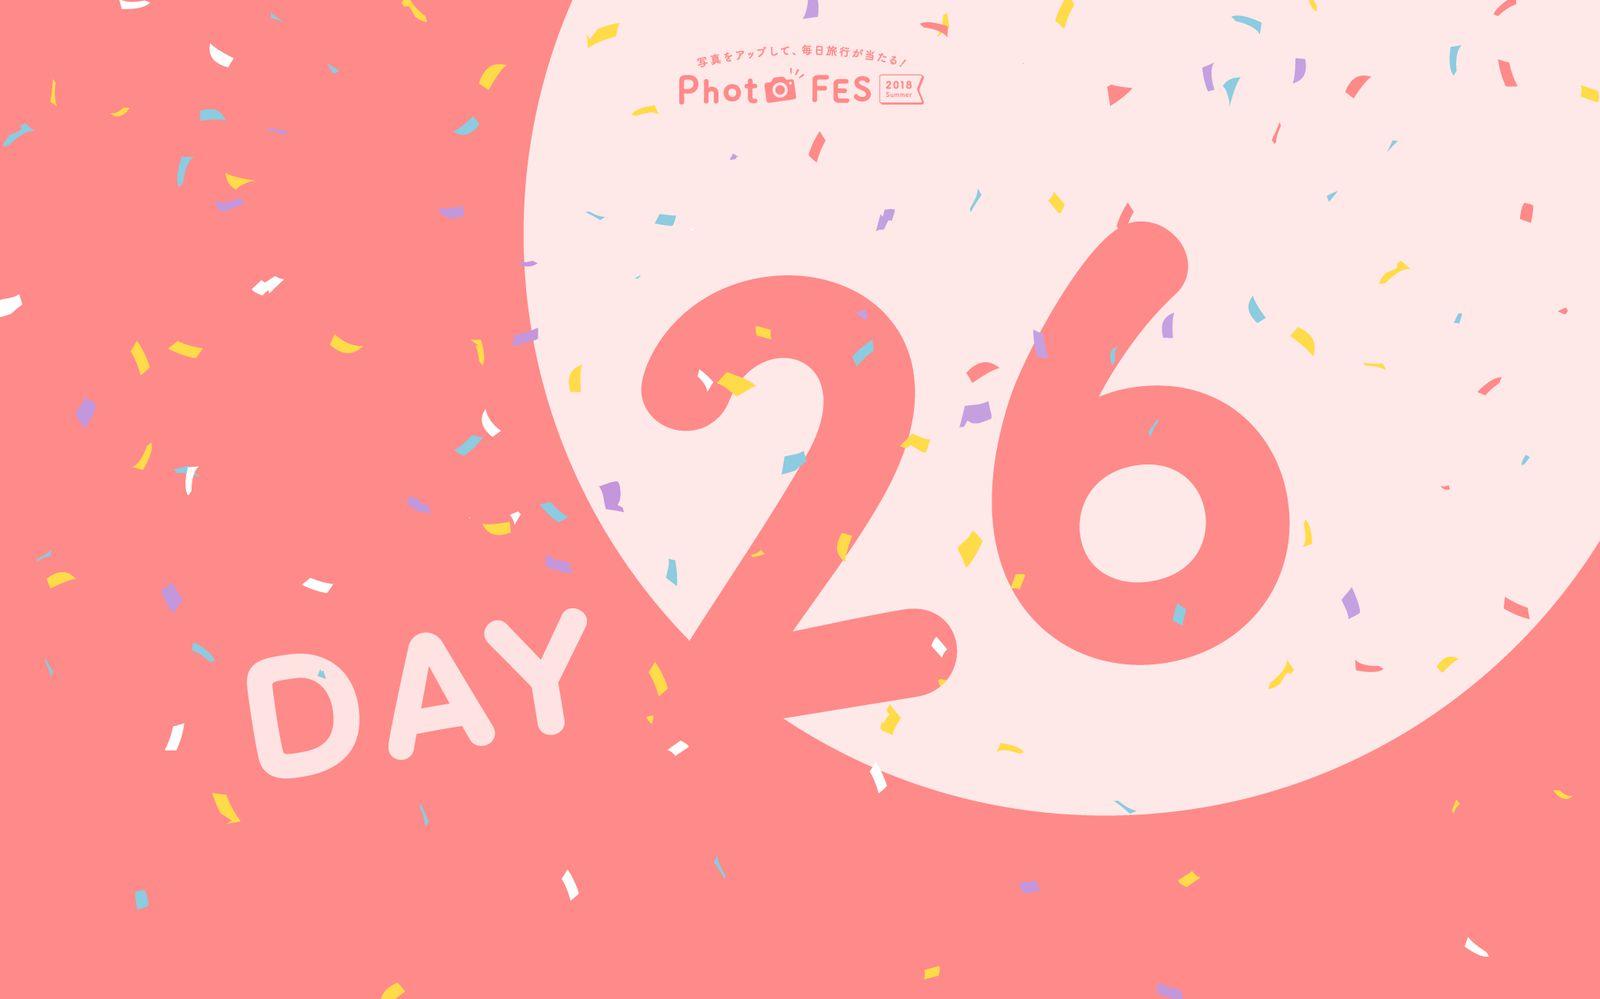 【DAY26】「Photo FES 2018」7月21日投稿分であたる賞品&受賞者発表